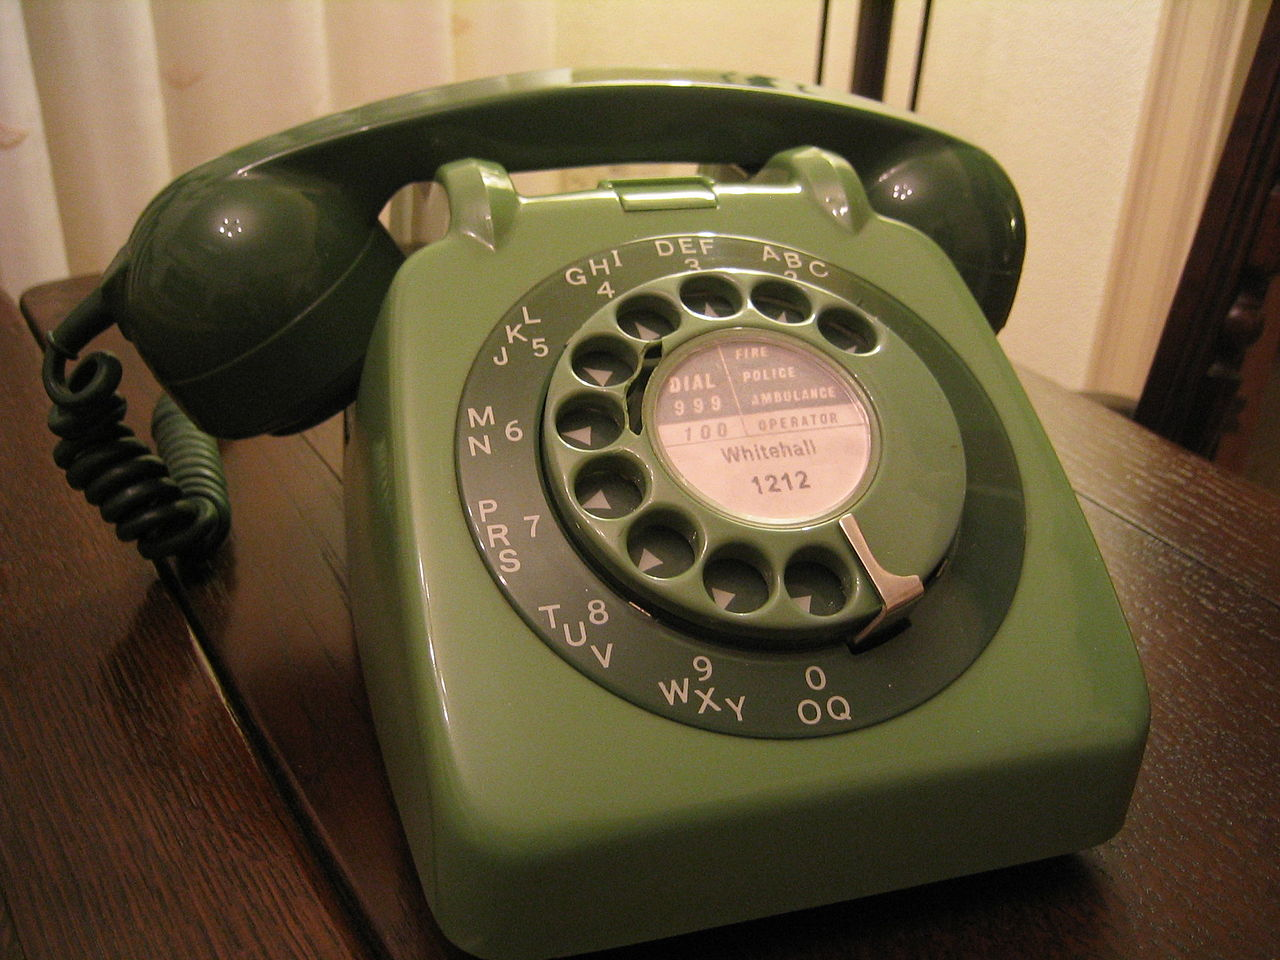 1280px-GPO_706_Green_Telephone.JPG